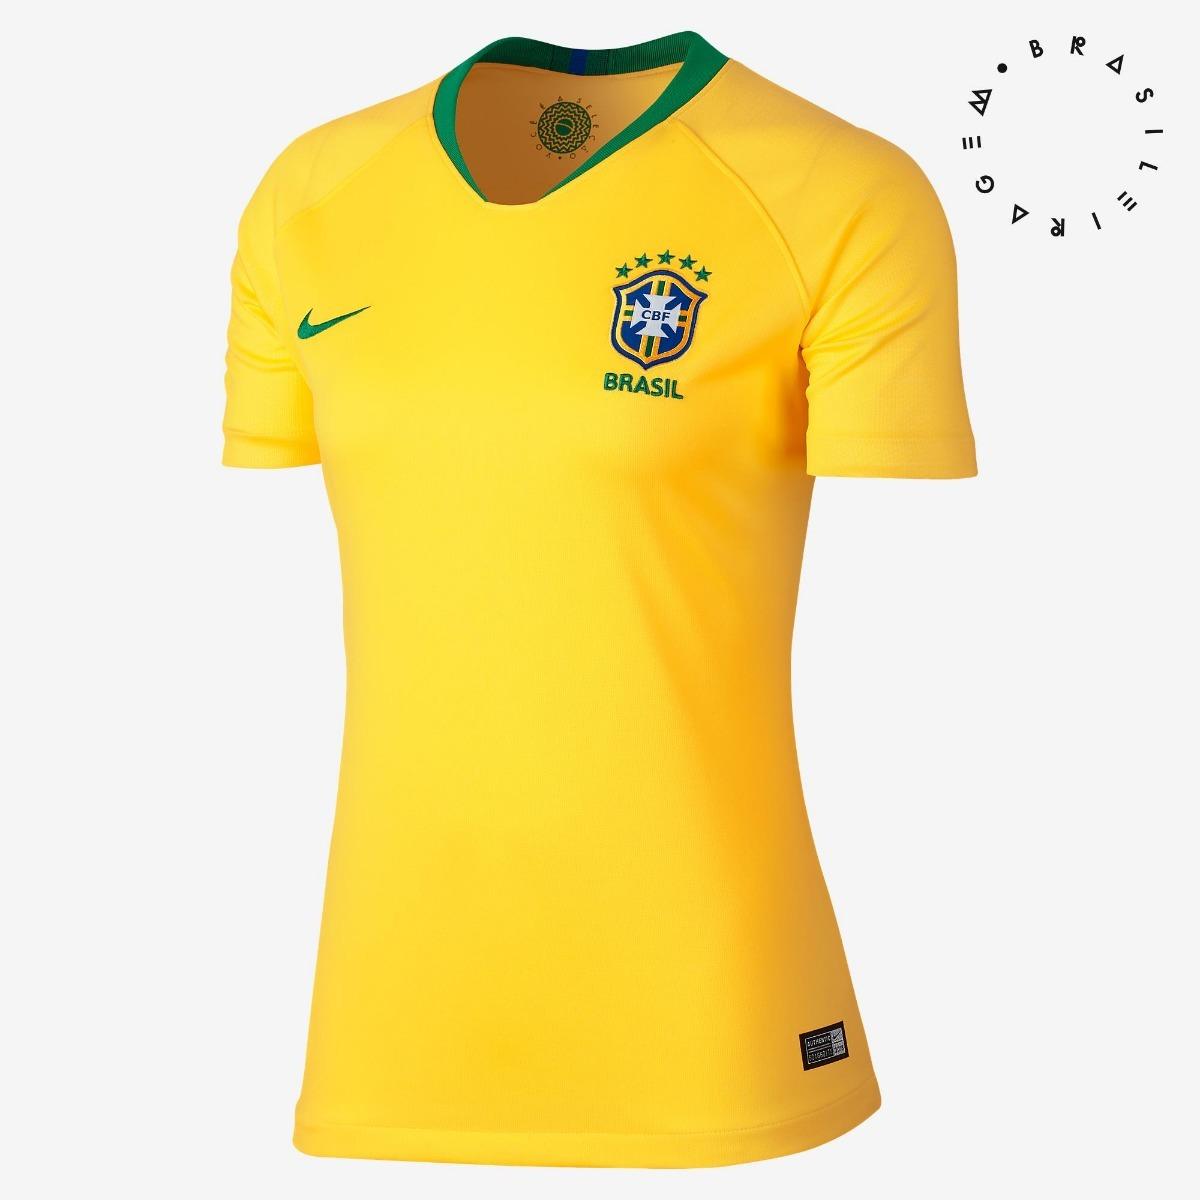 da6670601 blusa camisa camiseta feminina brasil copa do mundo 2018. Carregando zoom.